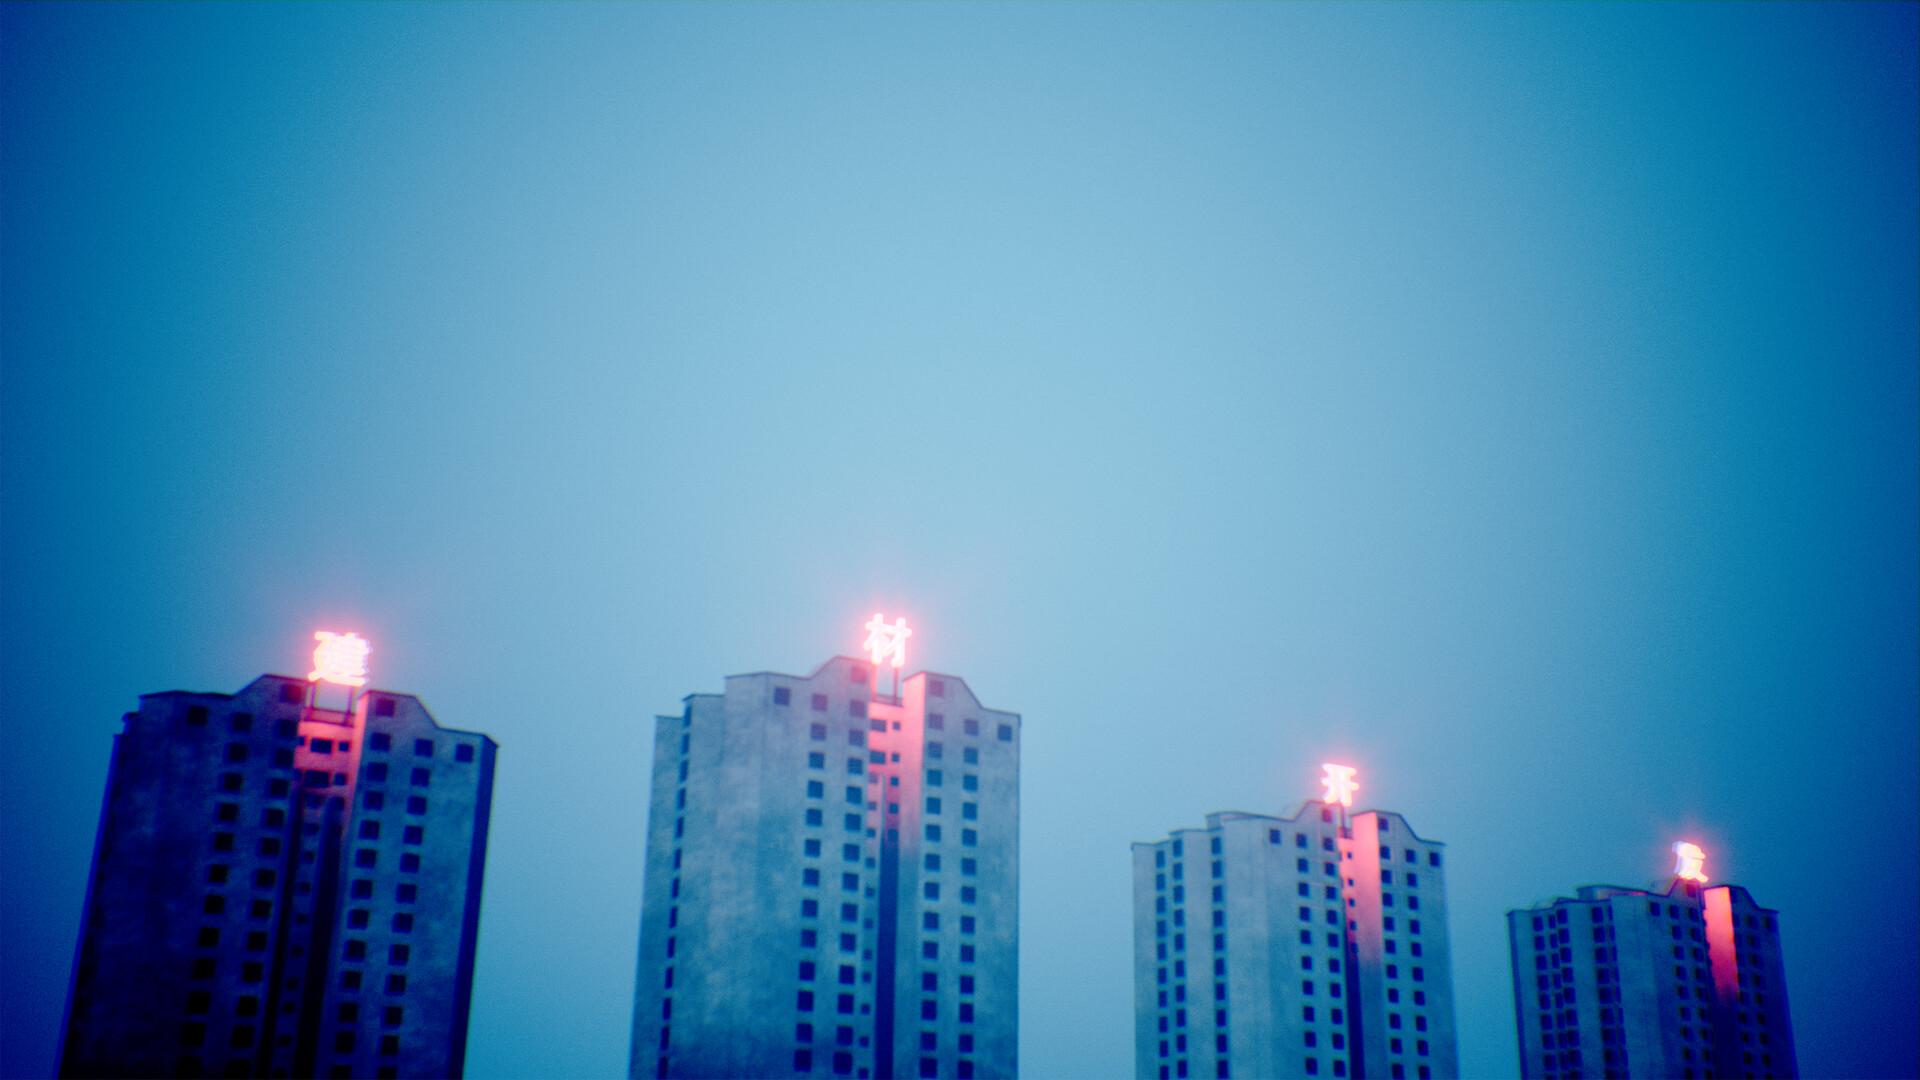 ArtStation - The Killers - Hot Fuss, Oli Egan